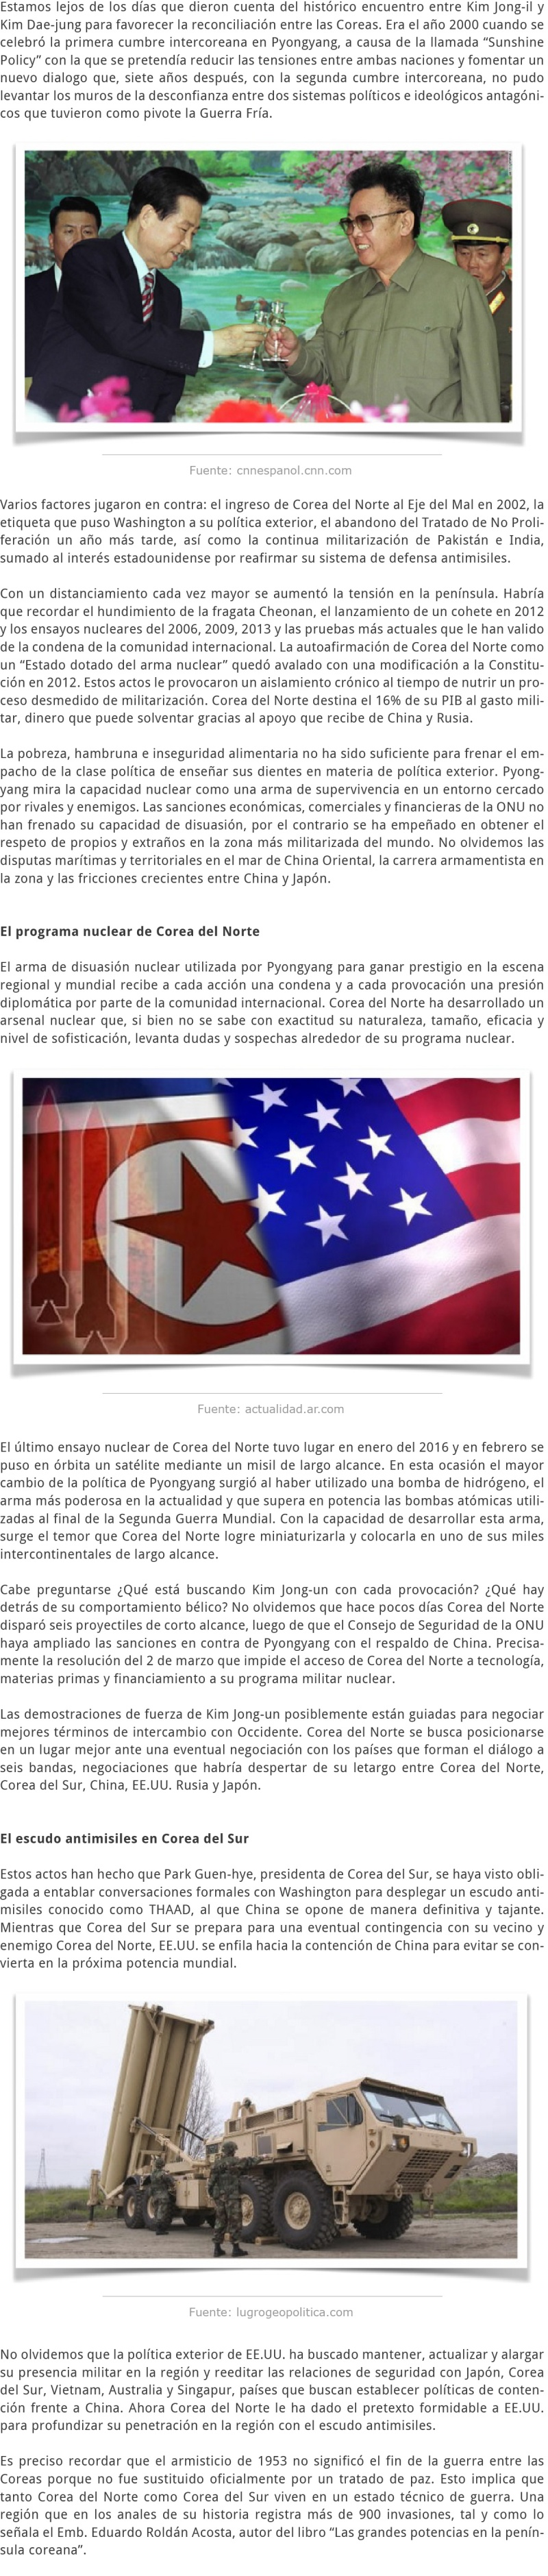 COREA DEL NORTE ENTRE AMENAZAS E INCERTIDUMBRES